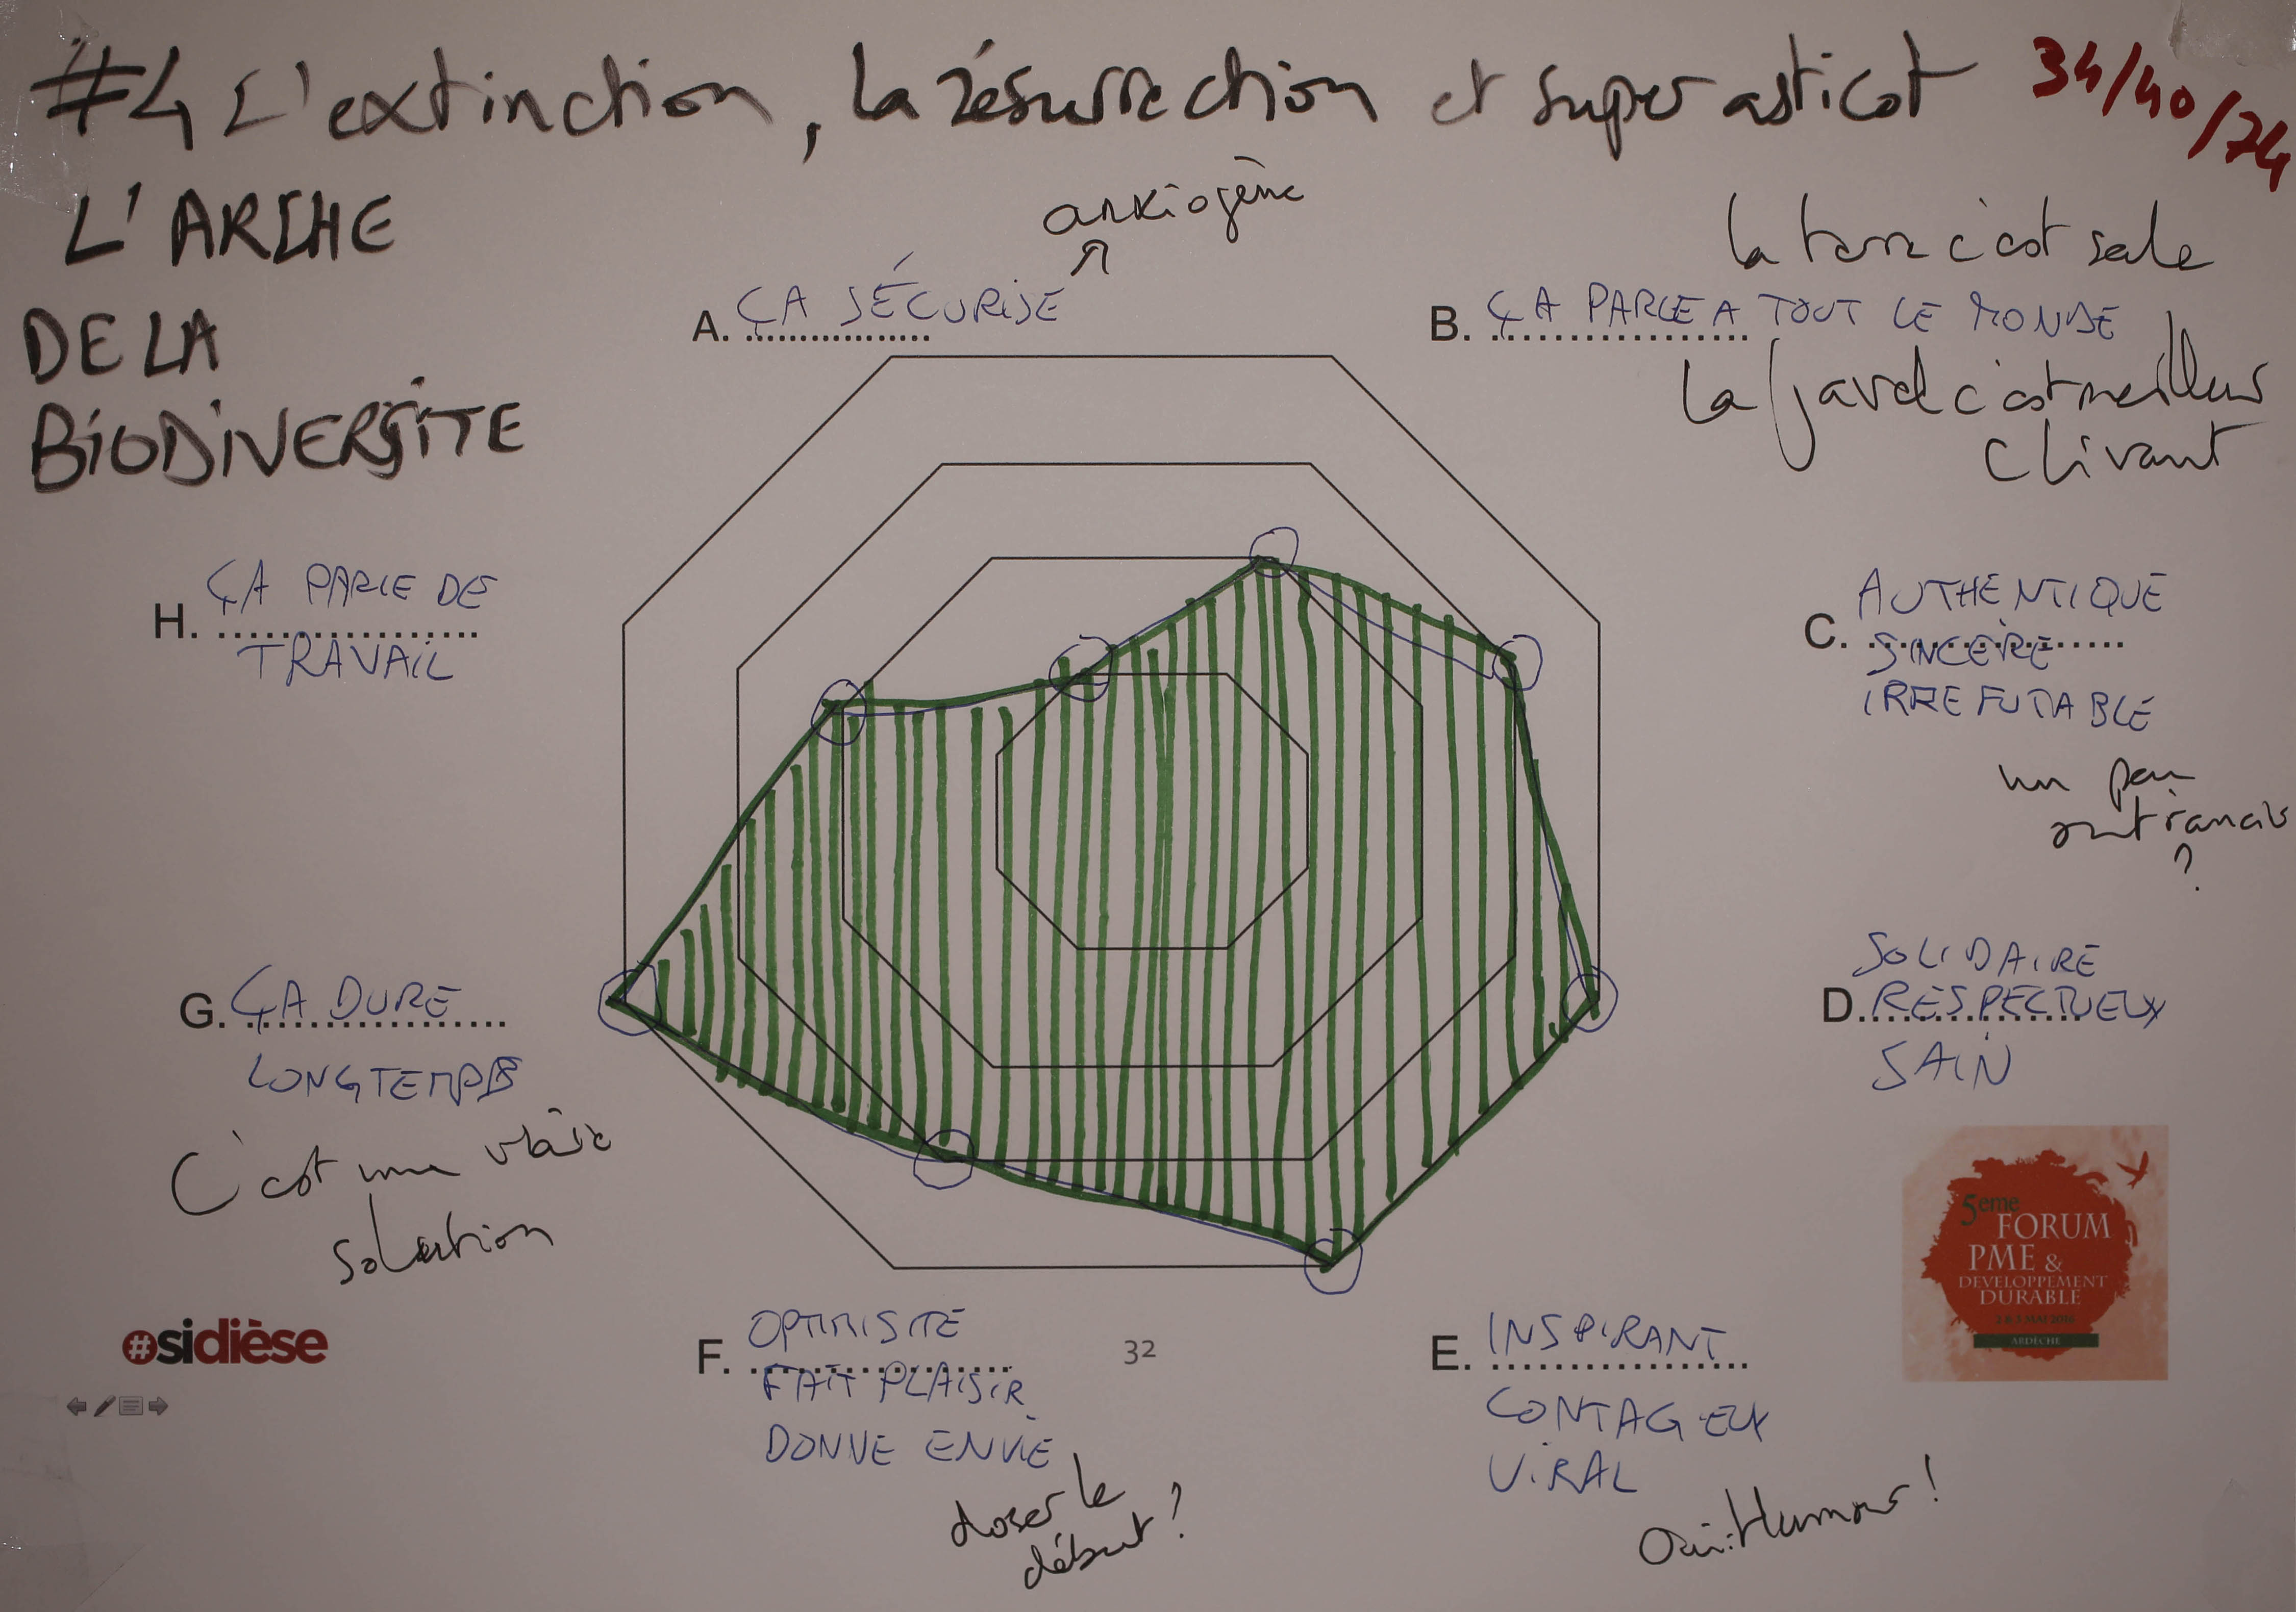 4 - Evaluation L Arche de la Biodiversite